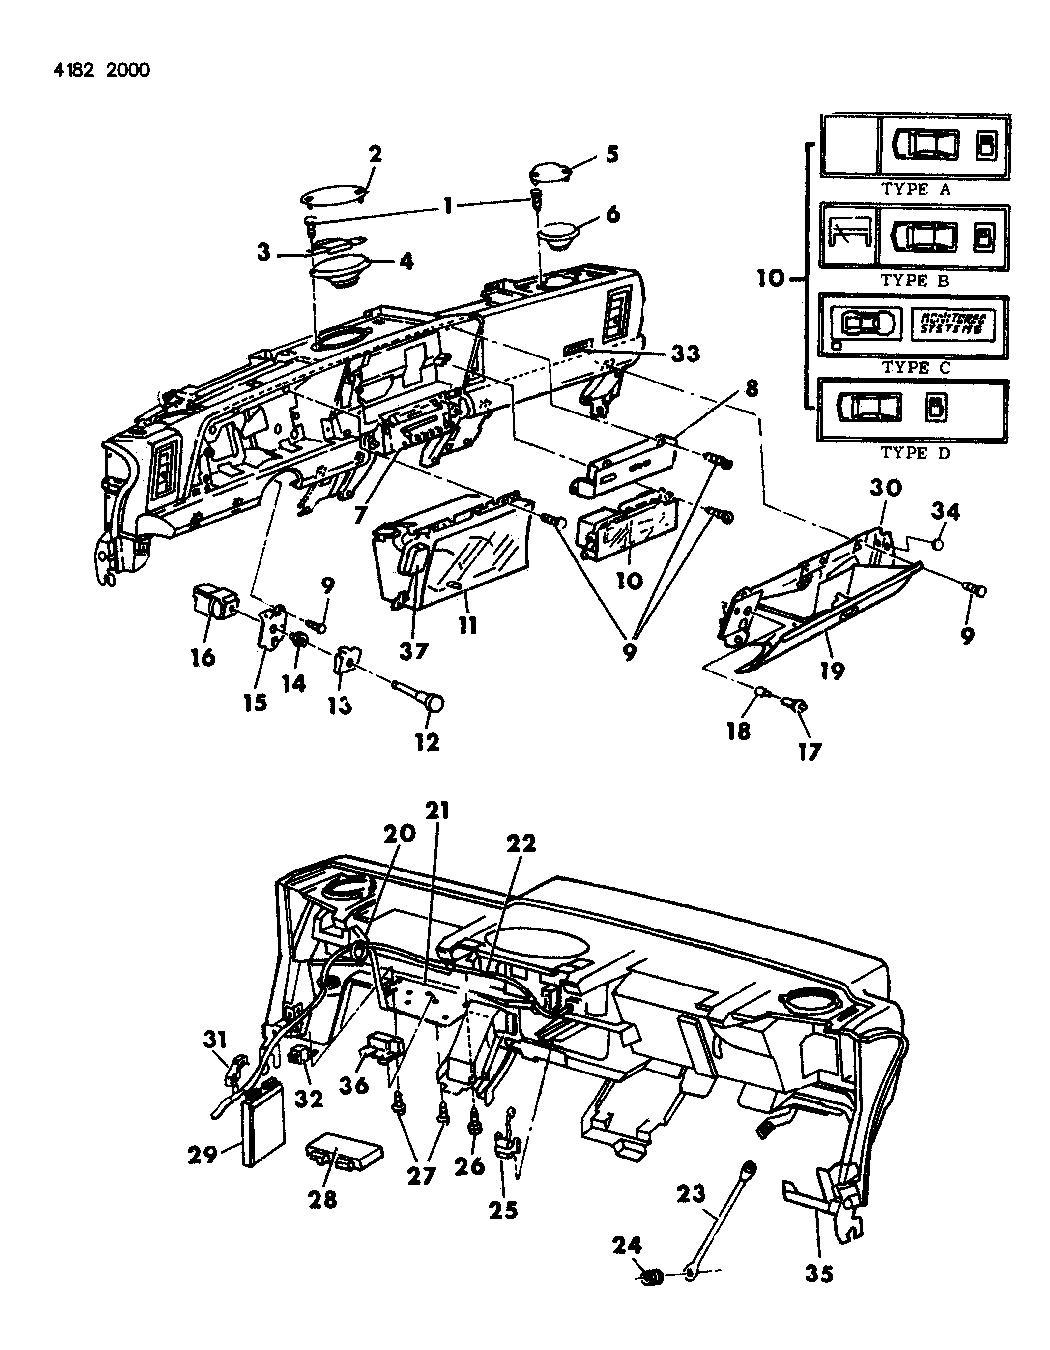 1984 Dodge Daytona Instrument Panel Cluster, Switches, Glovebox & Speakers